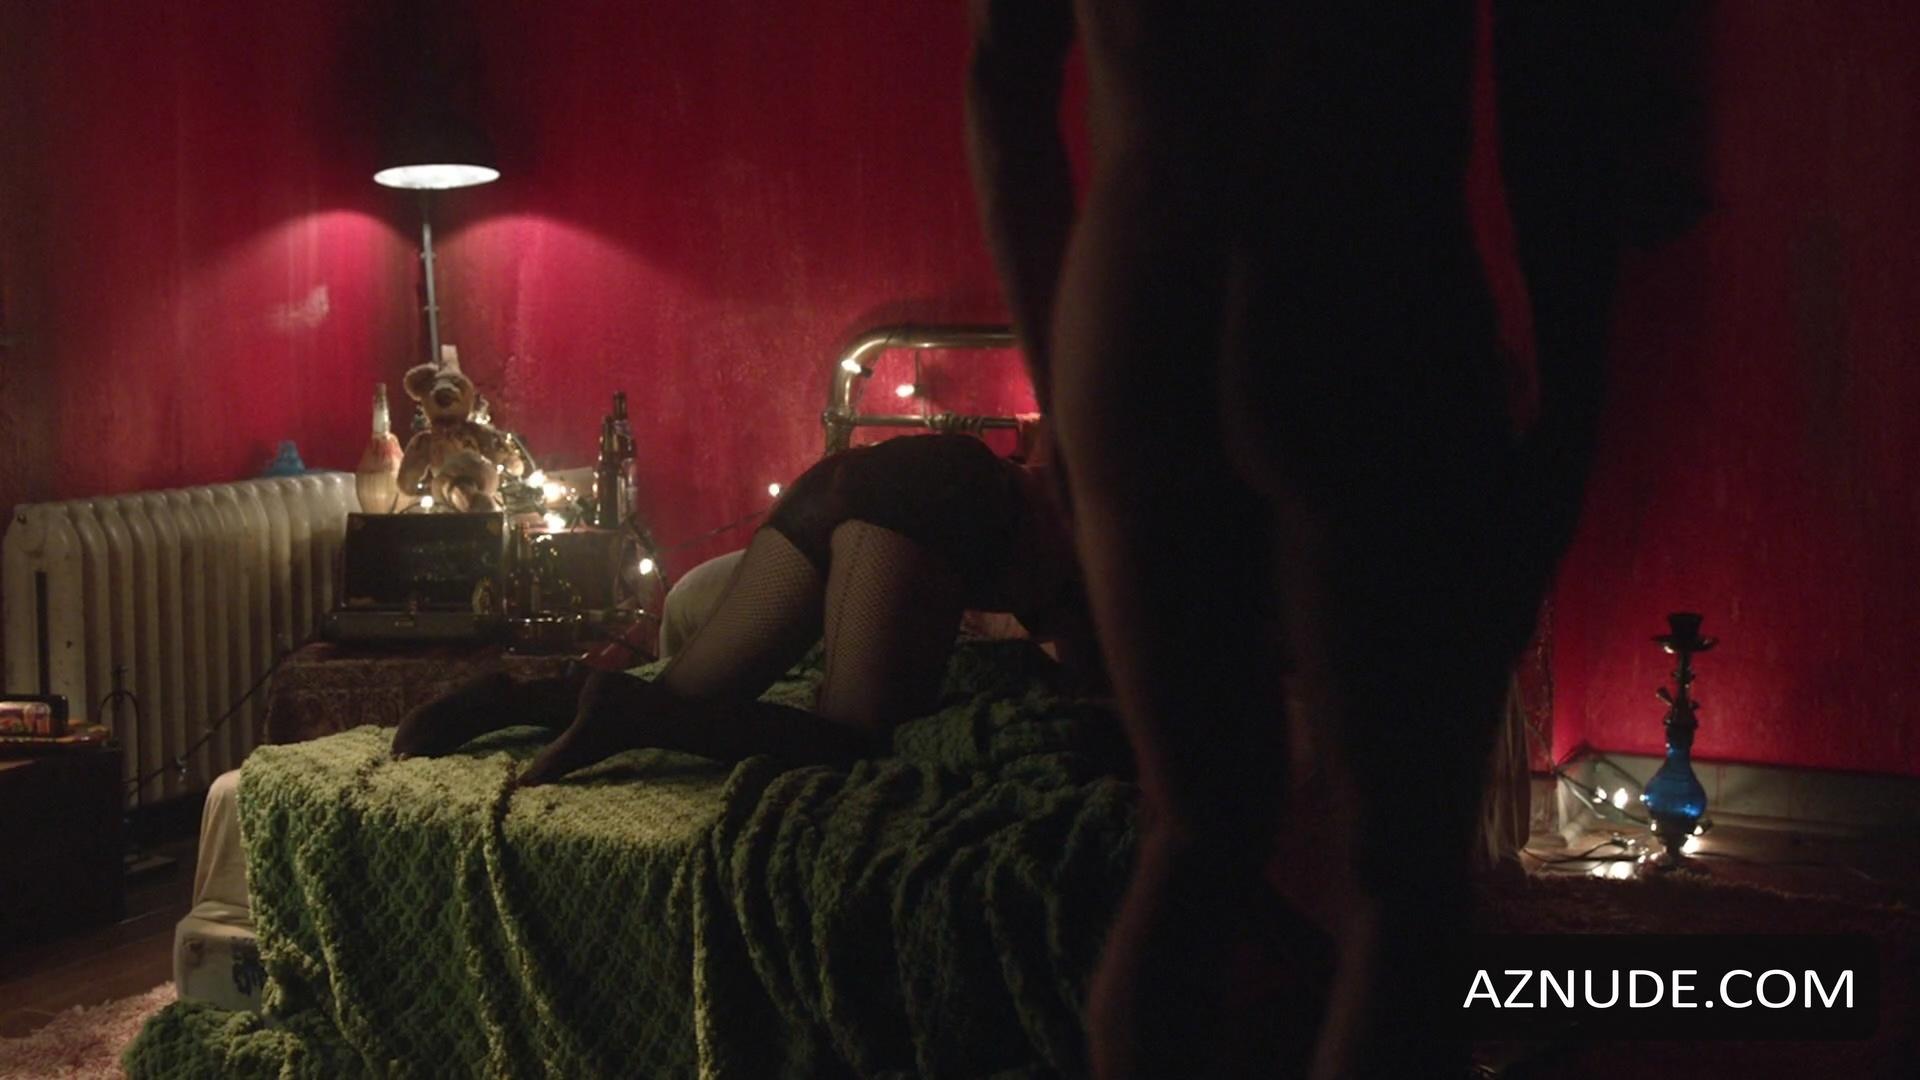 Vino Seeking Man Woman To Ashleymadison 50 45 Amaz